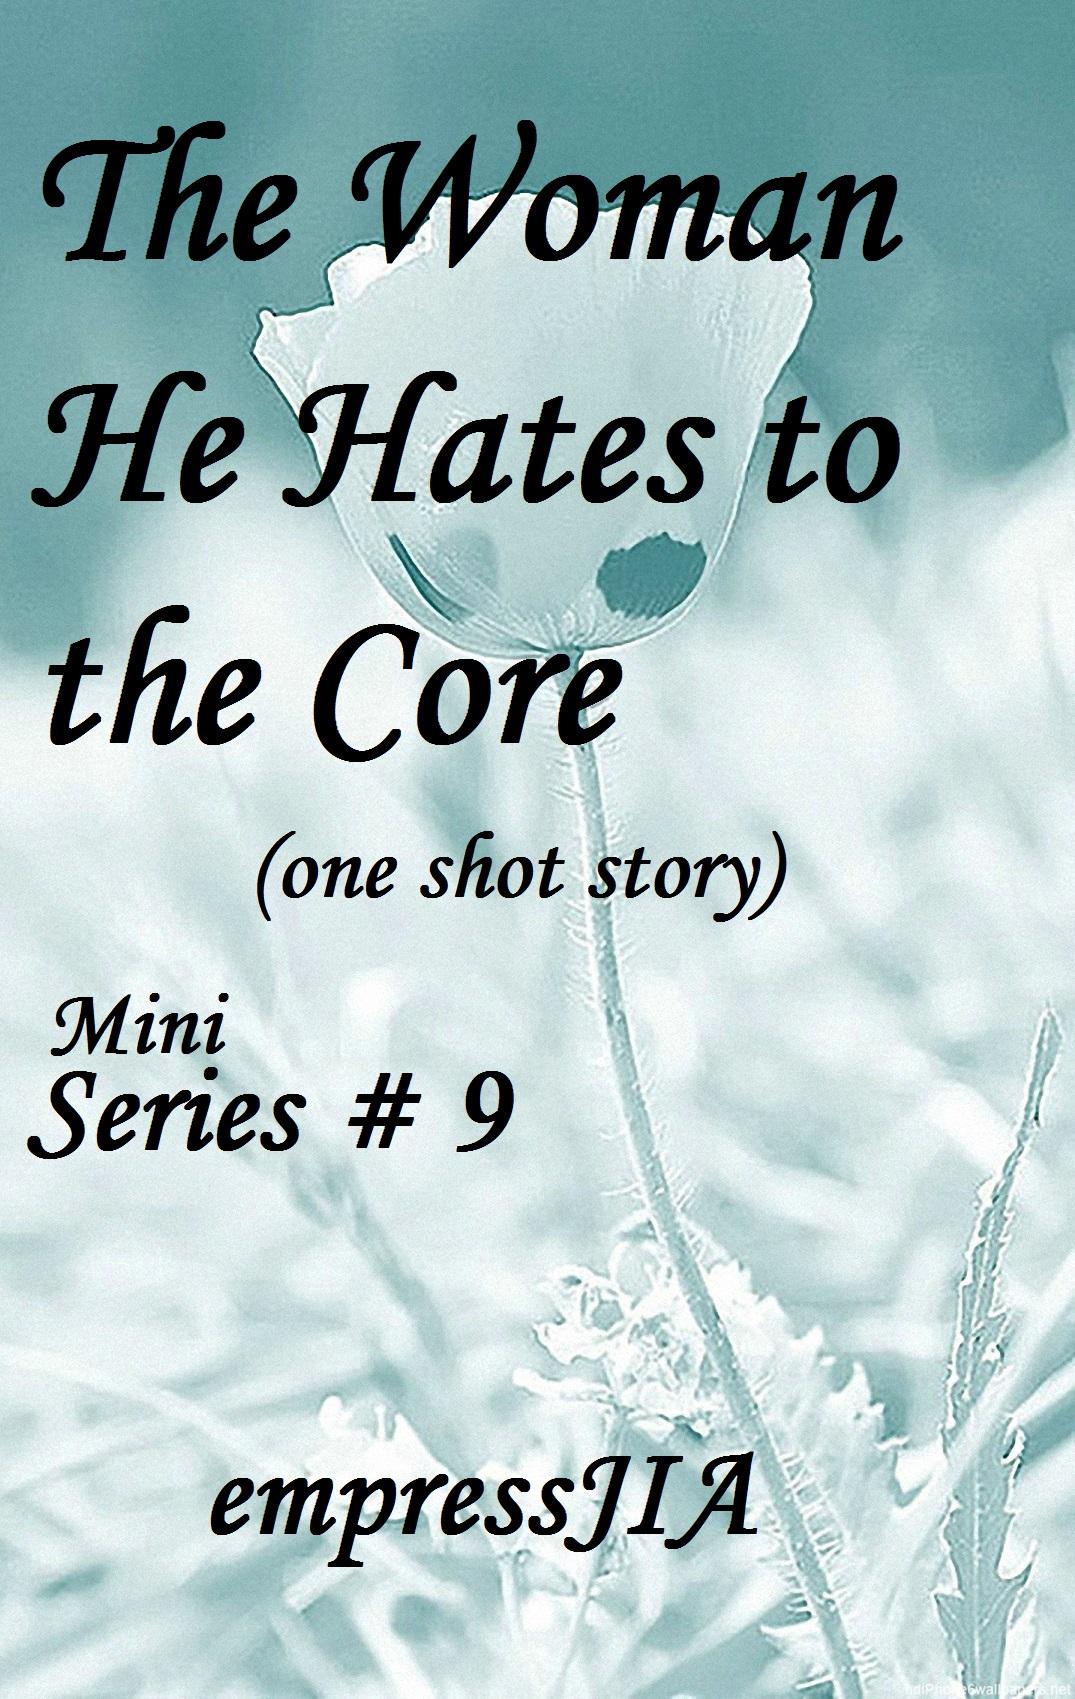 The Woman He Hates to the Core Mini series 9